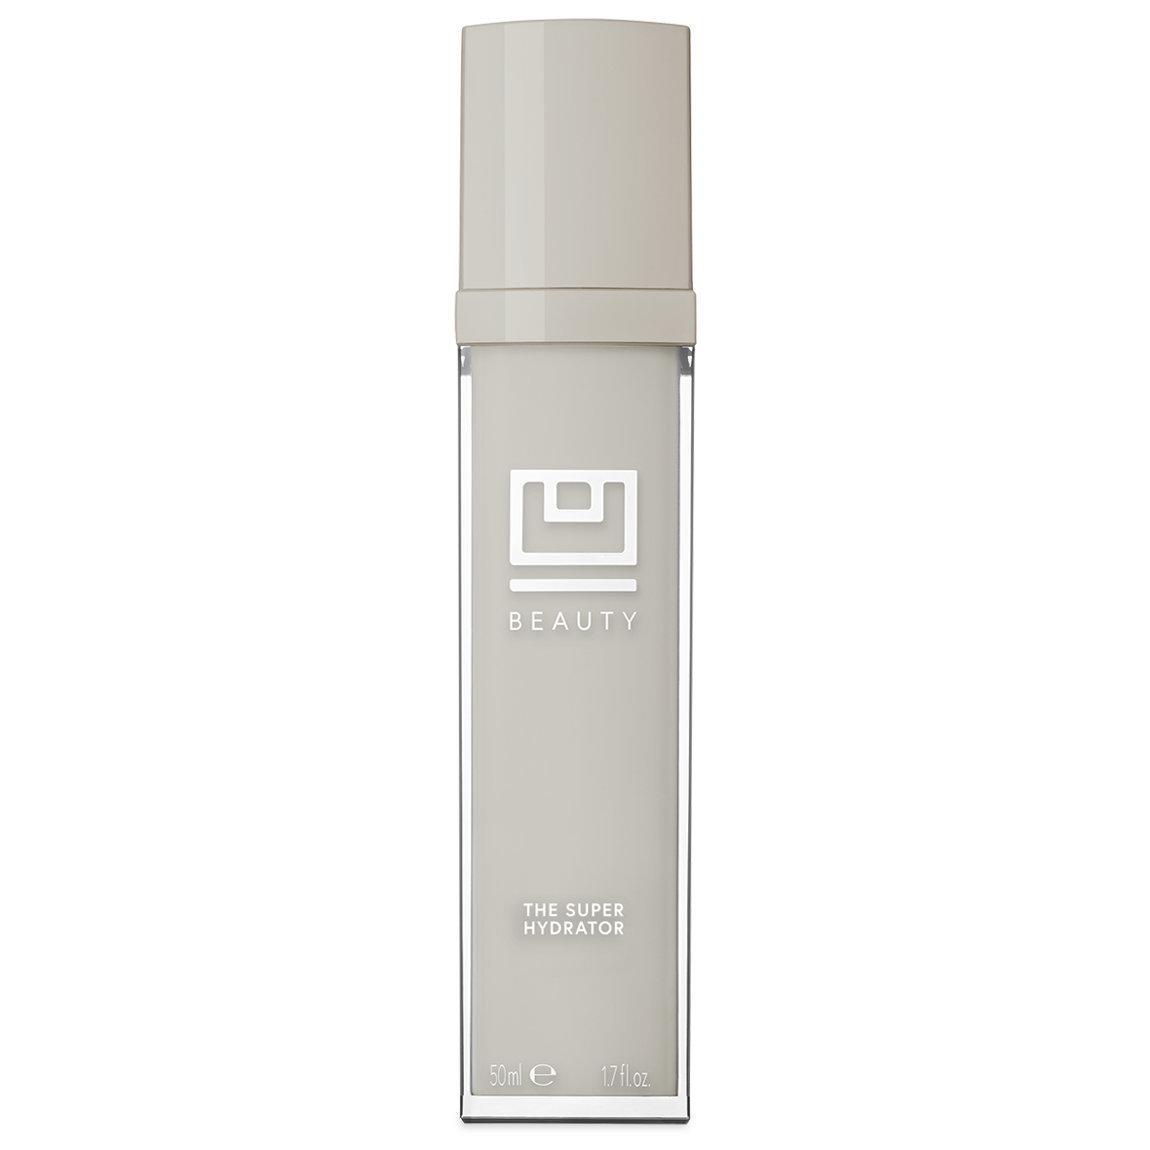 U Beauty The Super Hydrator 50 ml alternative view 1 - product swatch.